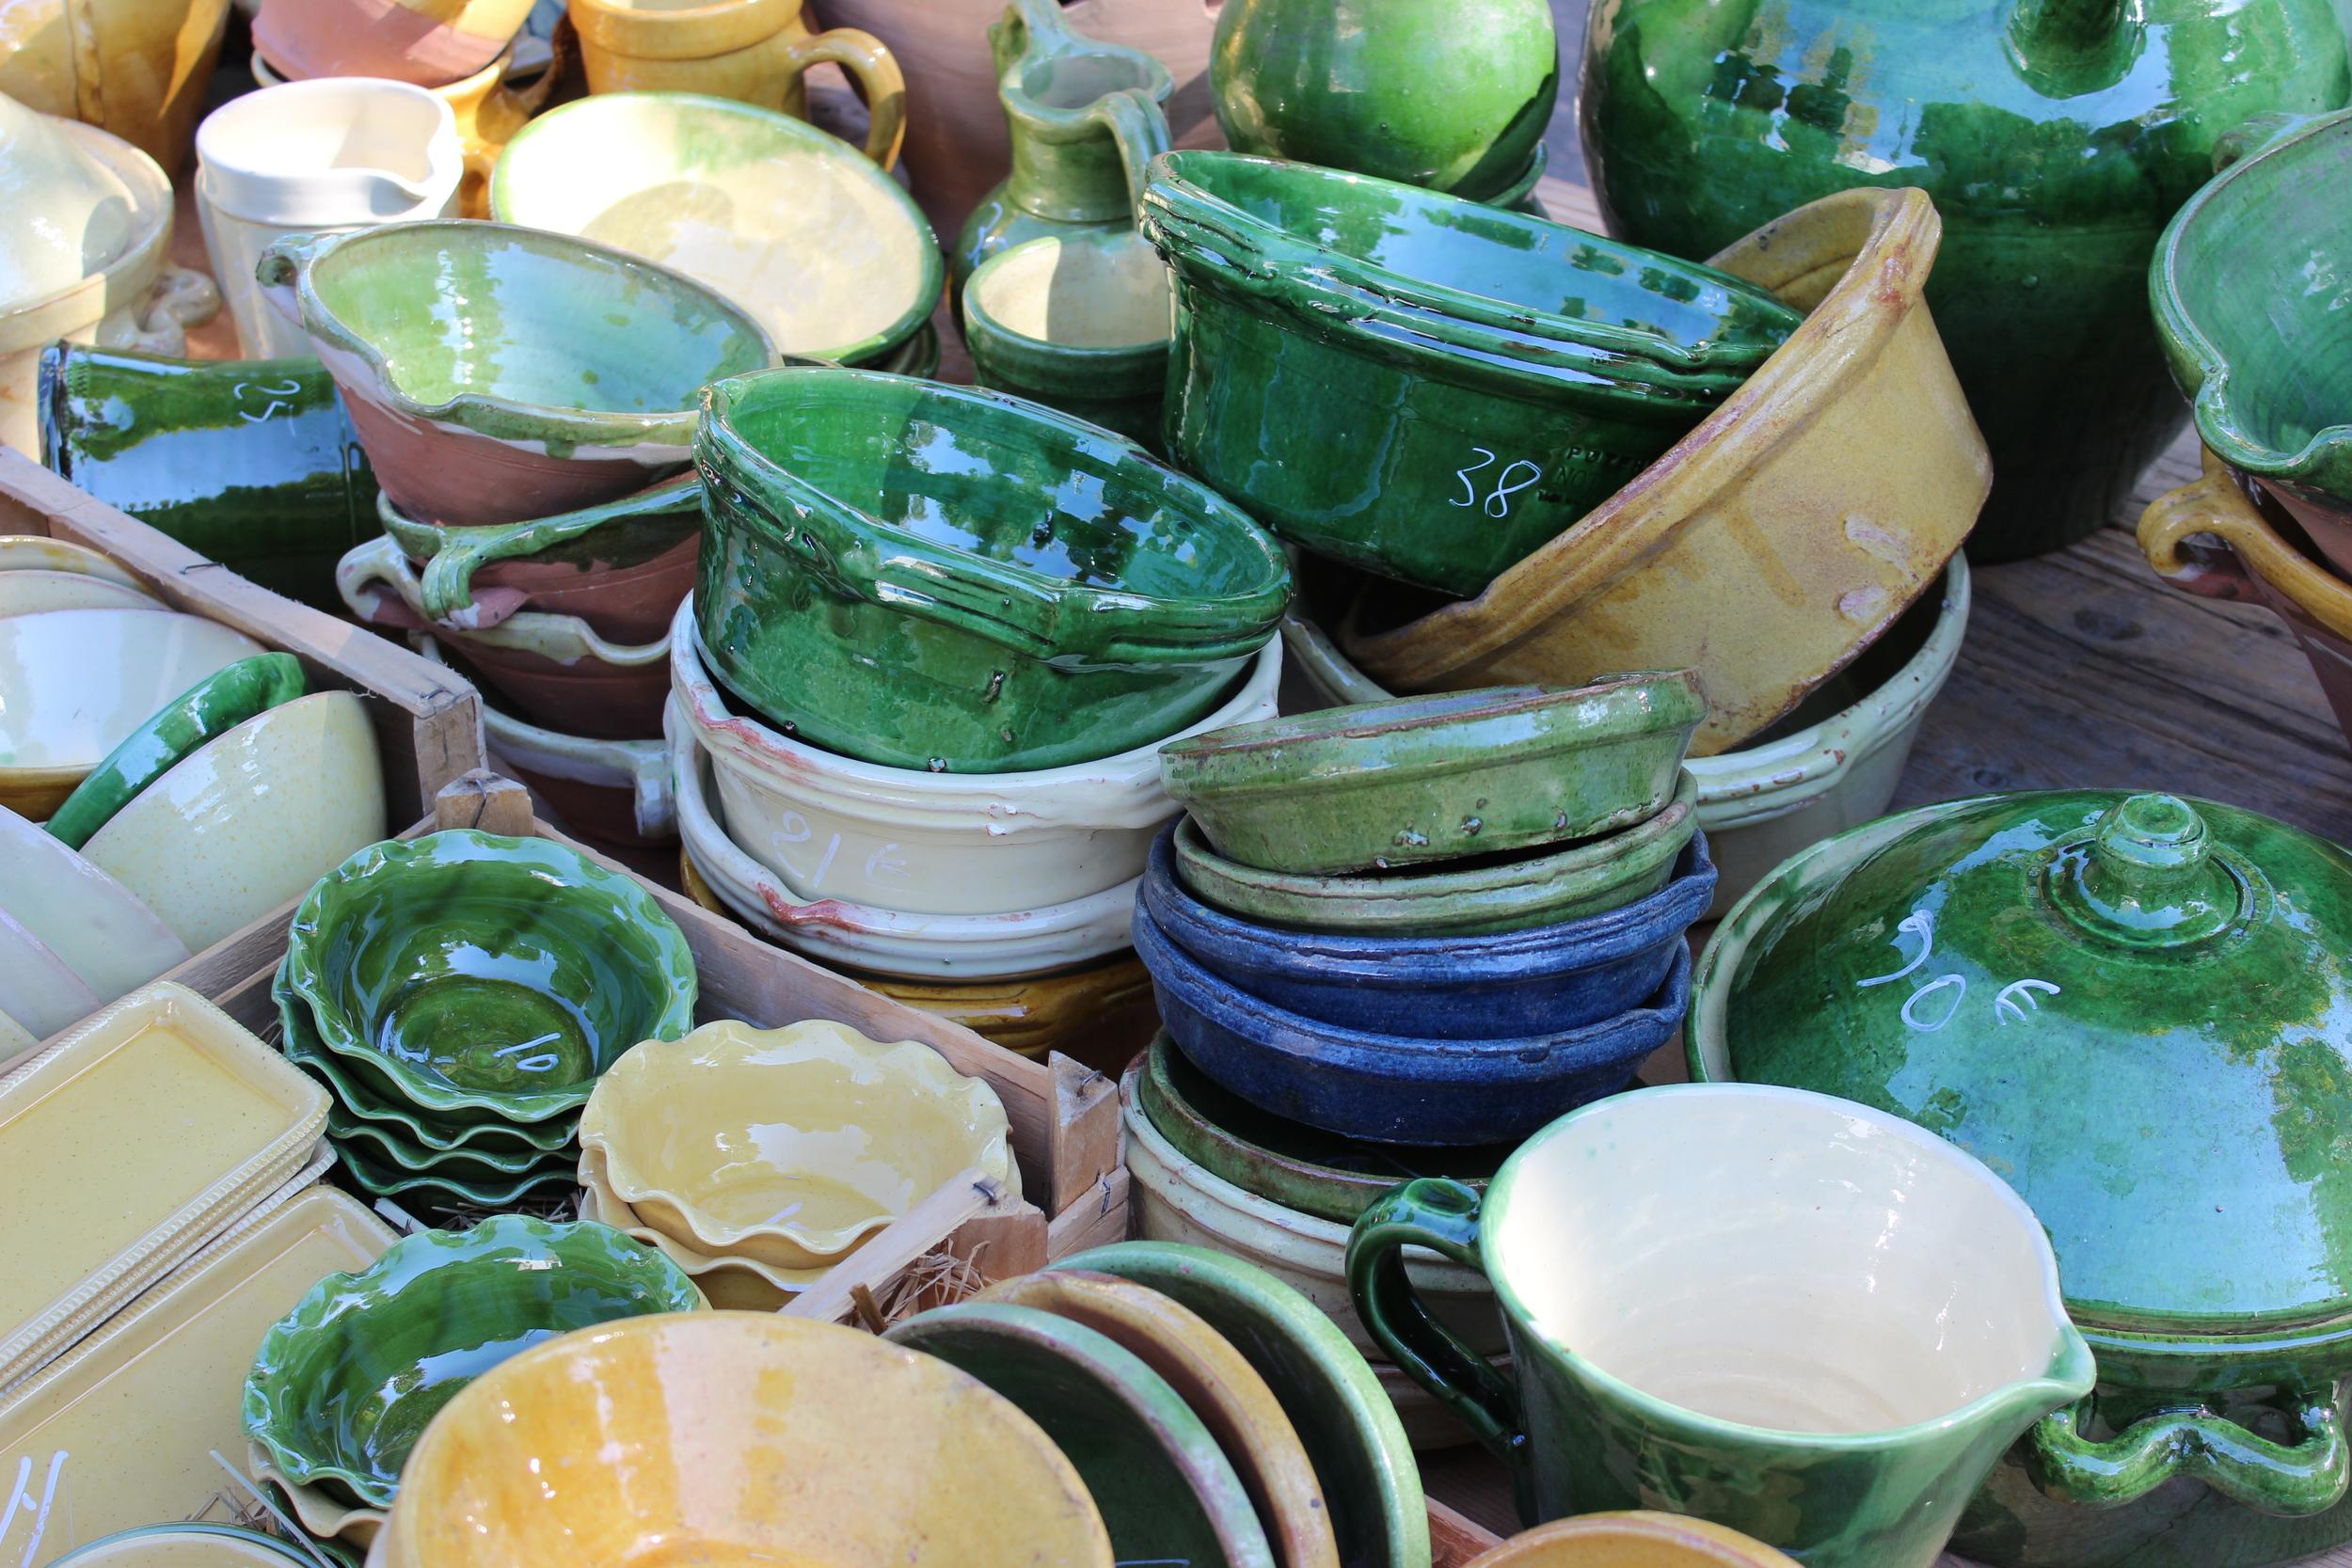 Provençal pottery at the Saint Remy market (Elspeth Copeland)